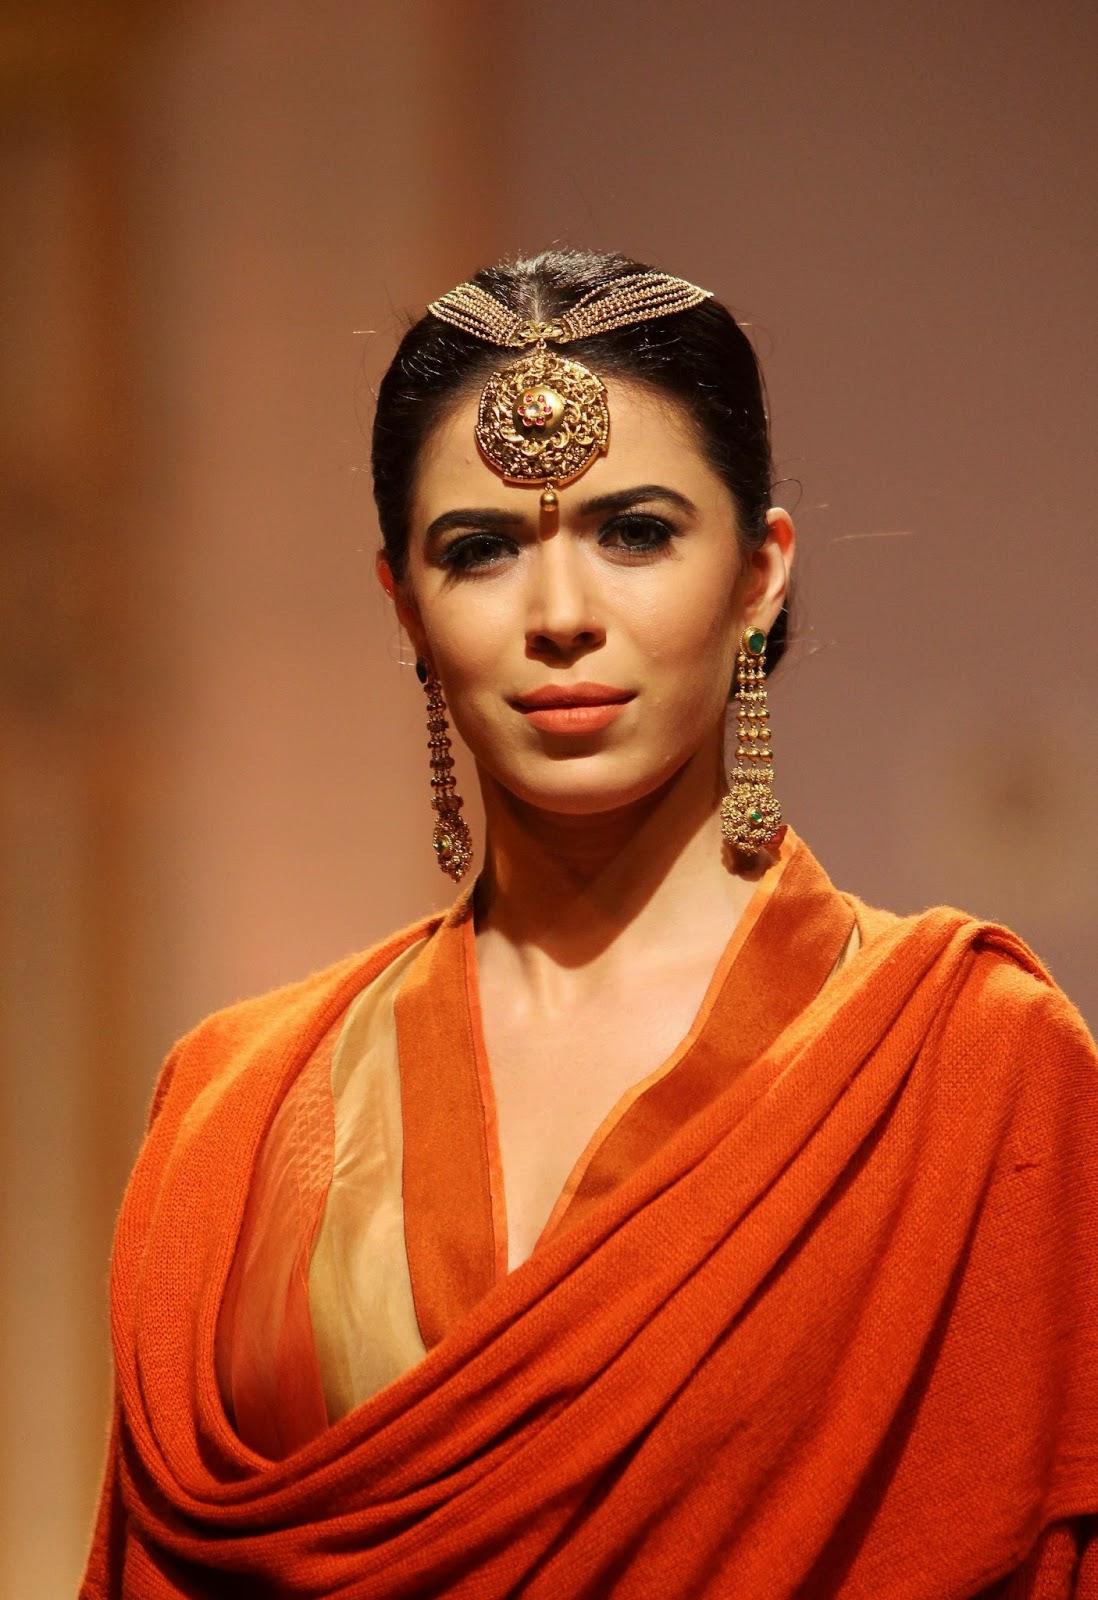 The Glitzy World !!: Azva launches new gold bridal jewellery collection - photo#15